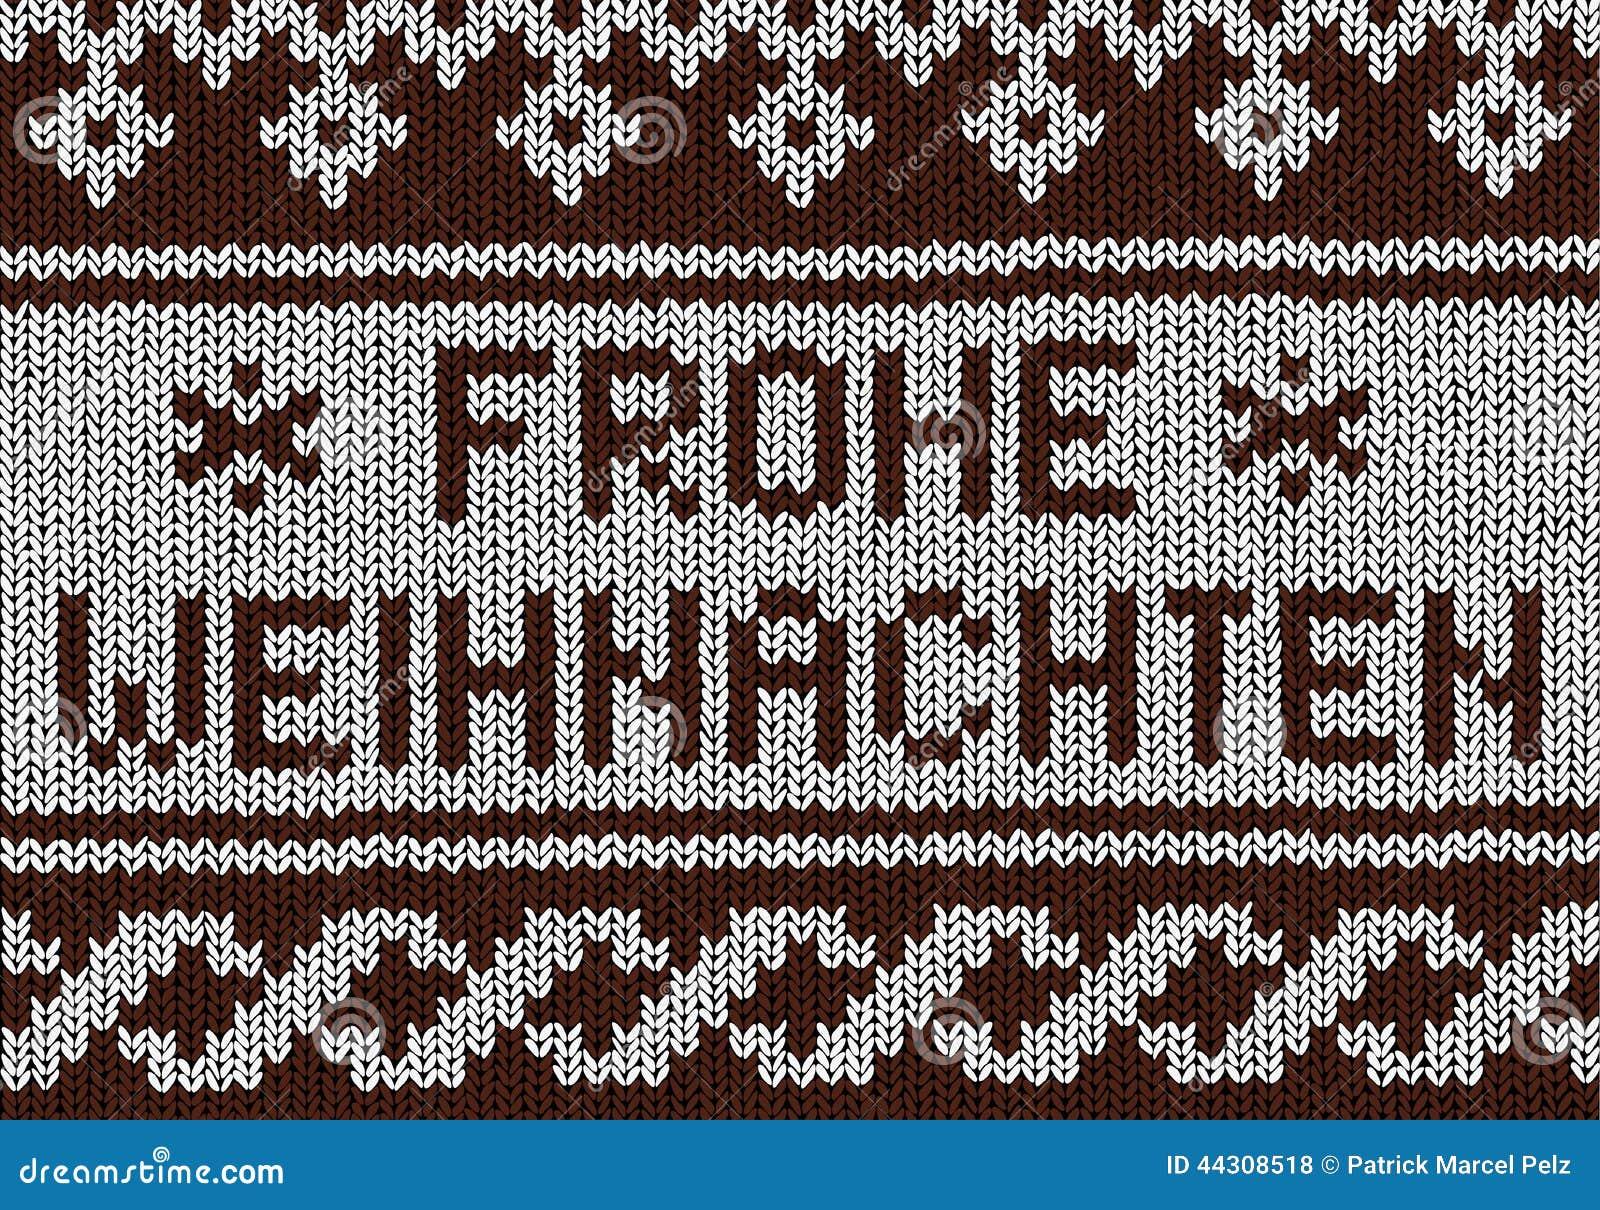 Christmas Background - Norwegian Knitting Patterns Stock Vector ...